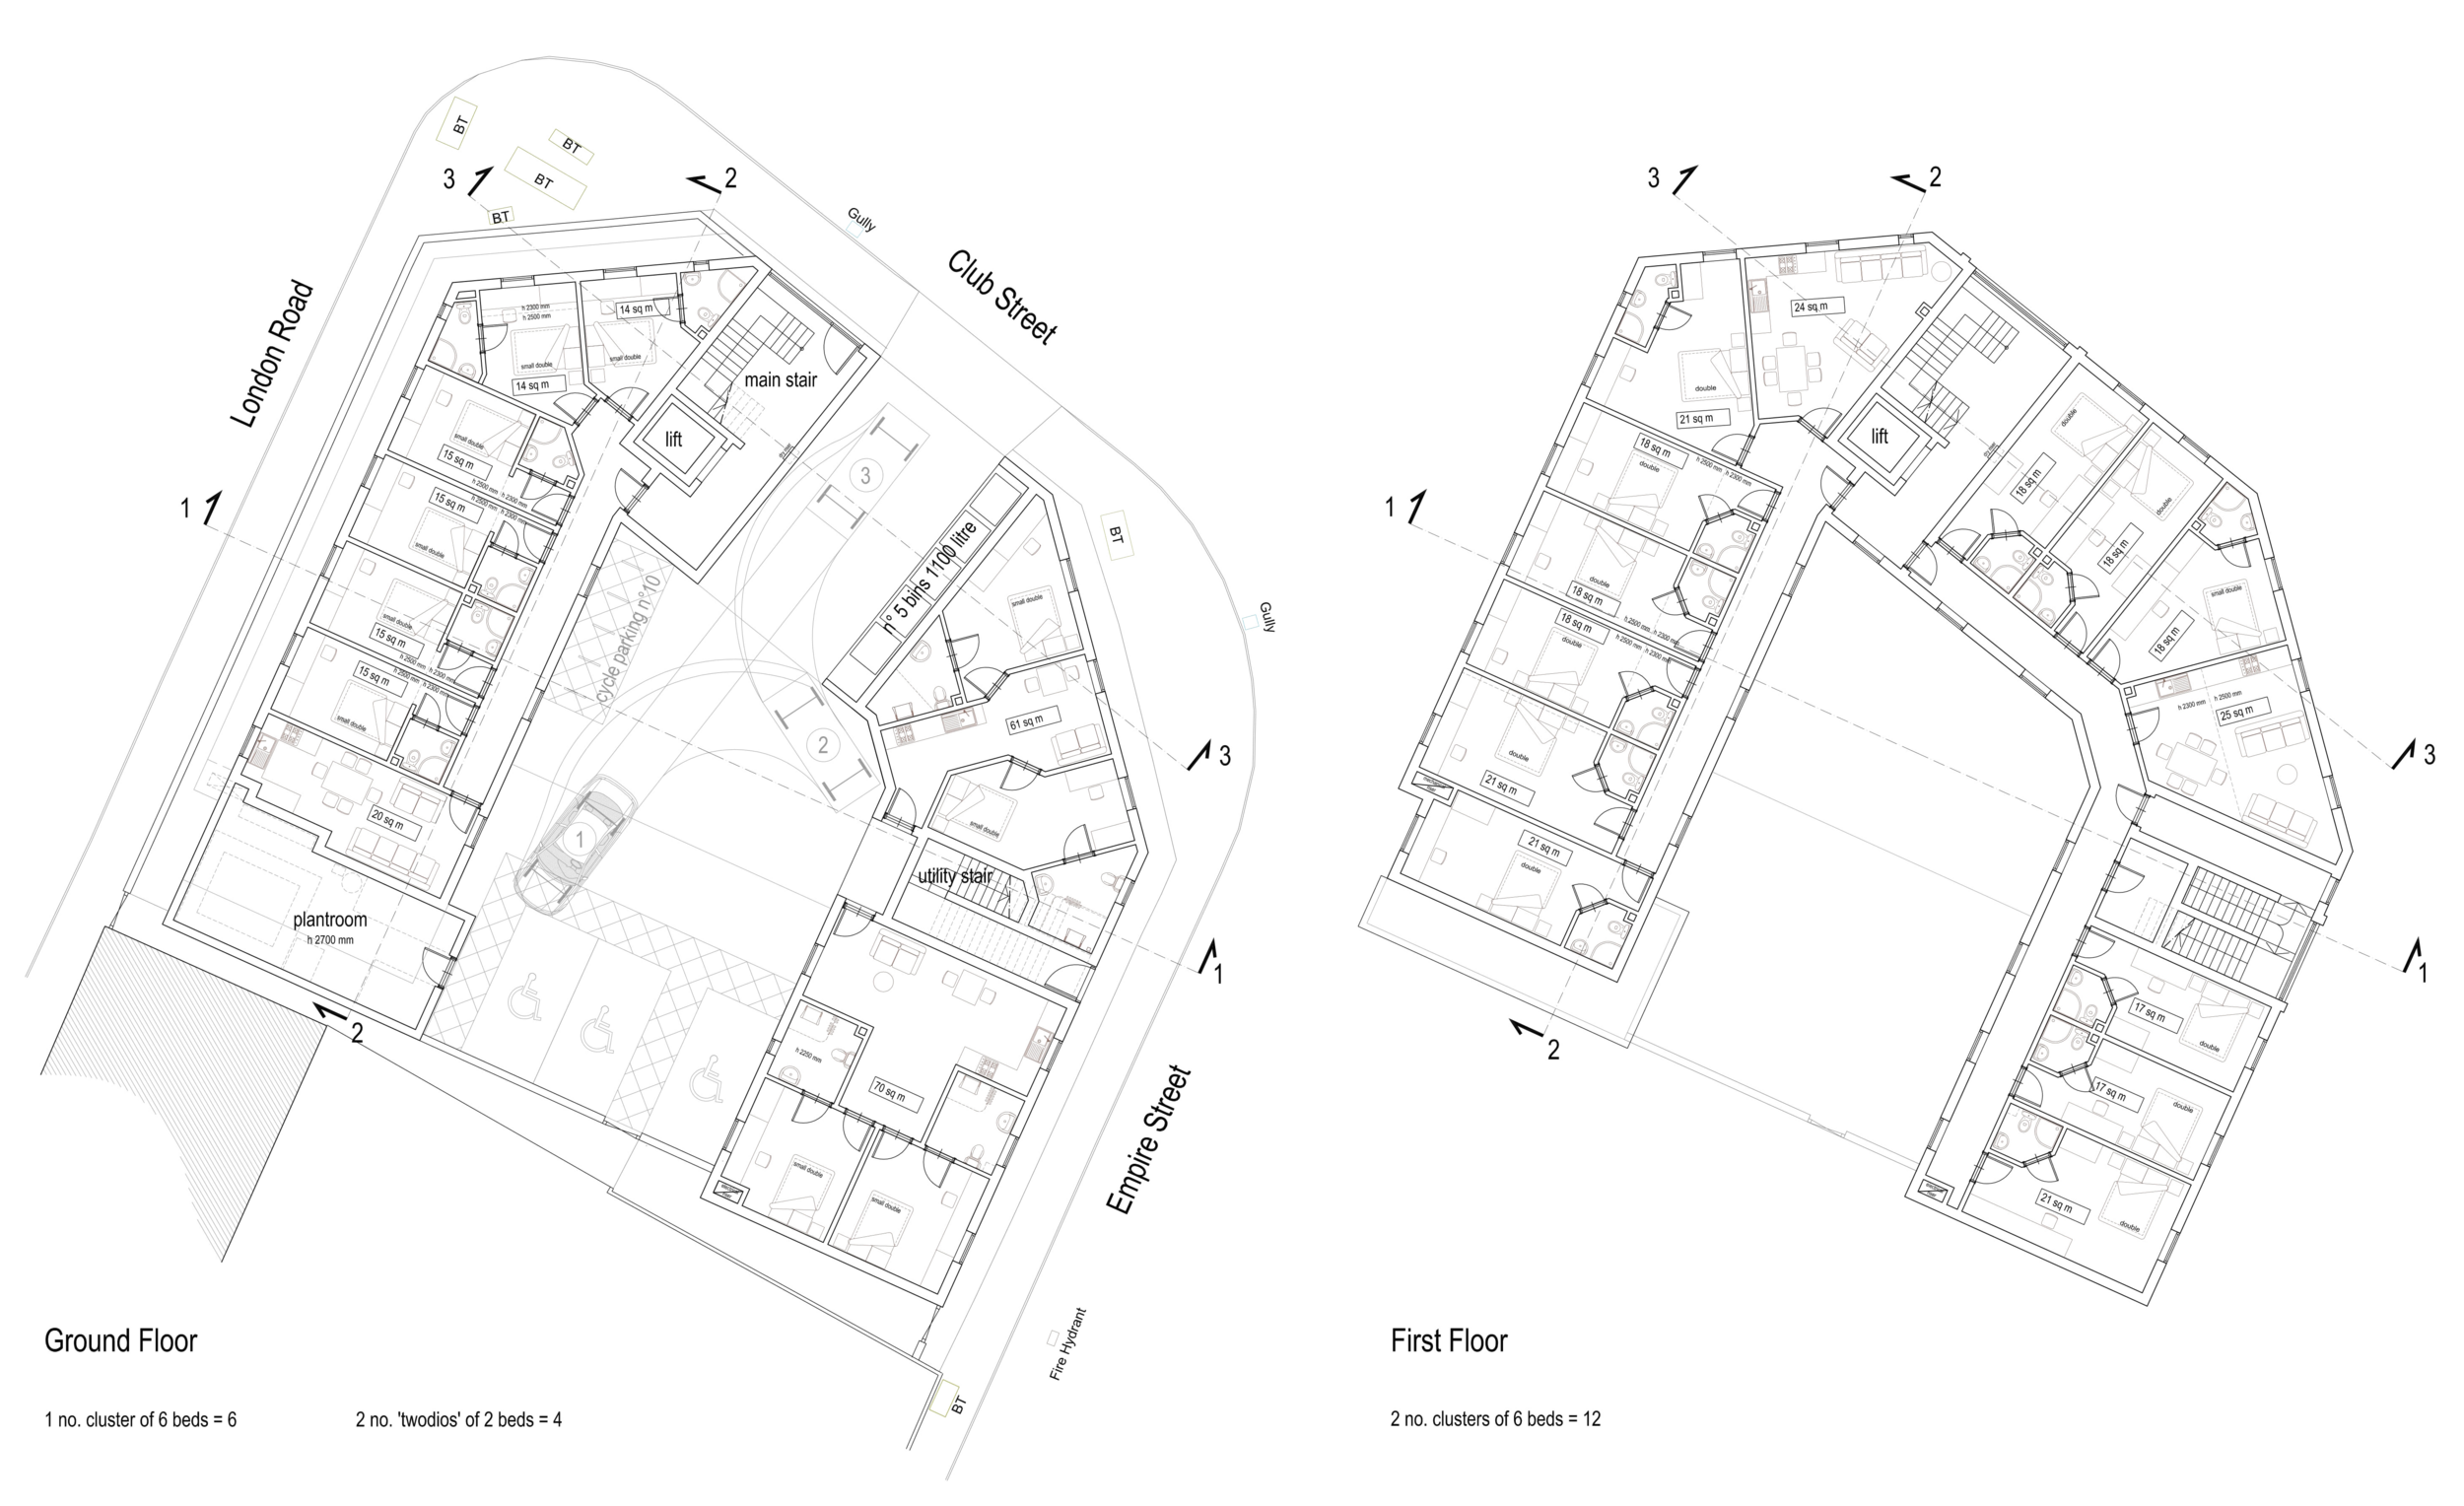 1213-CA-AP-101&102-R06 Proposed GF & FF Plans-1.png